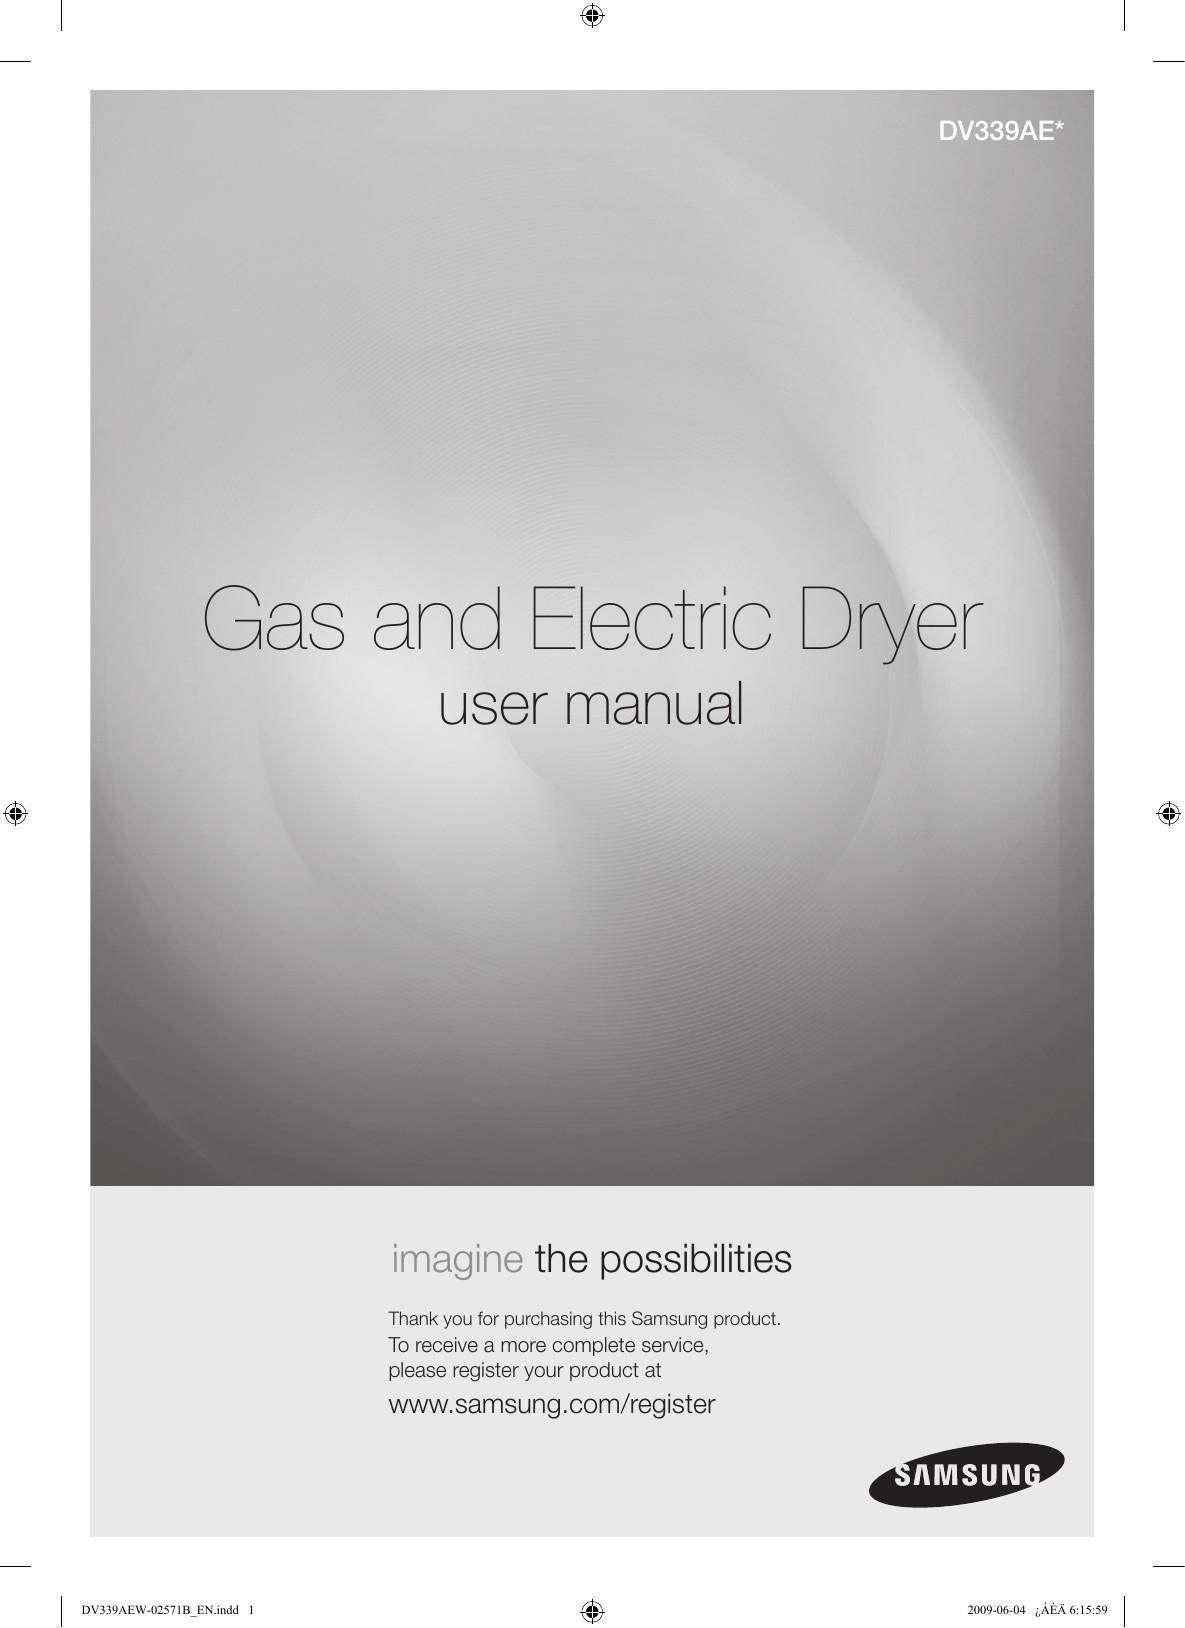 Wiring Diagrahm for Samsung Gas Dryer Samsung Dv339aeg Xac User Manual Of Wiring Diagrahm for Samsung Gas Dryer